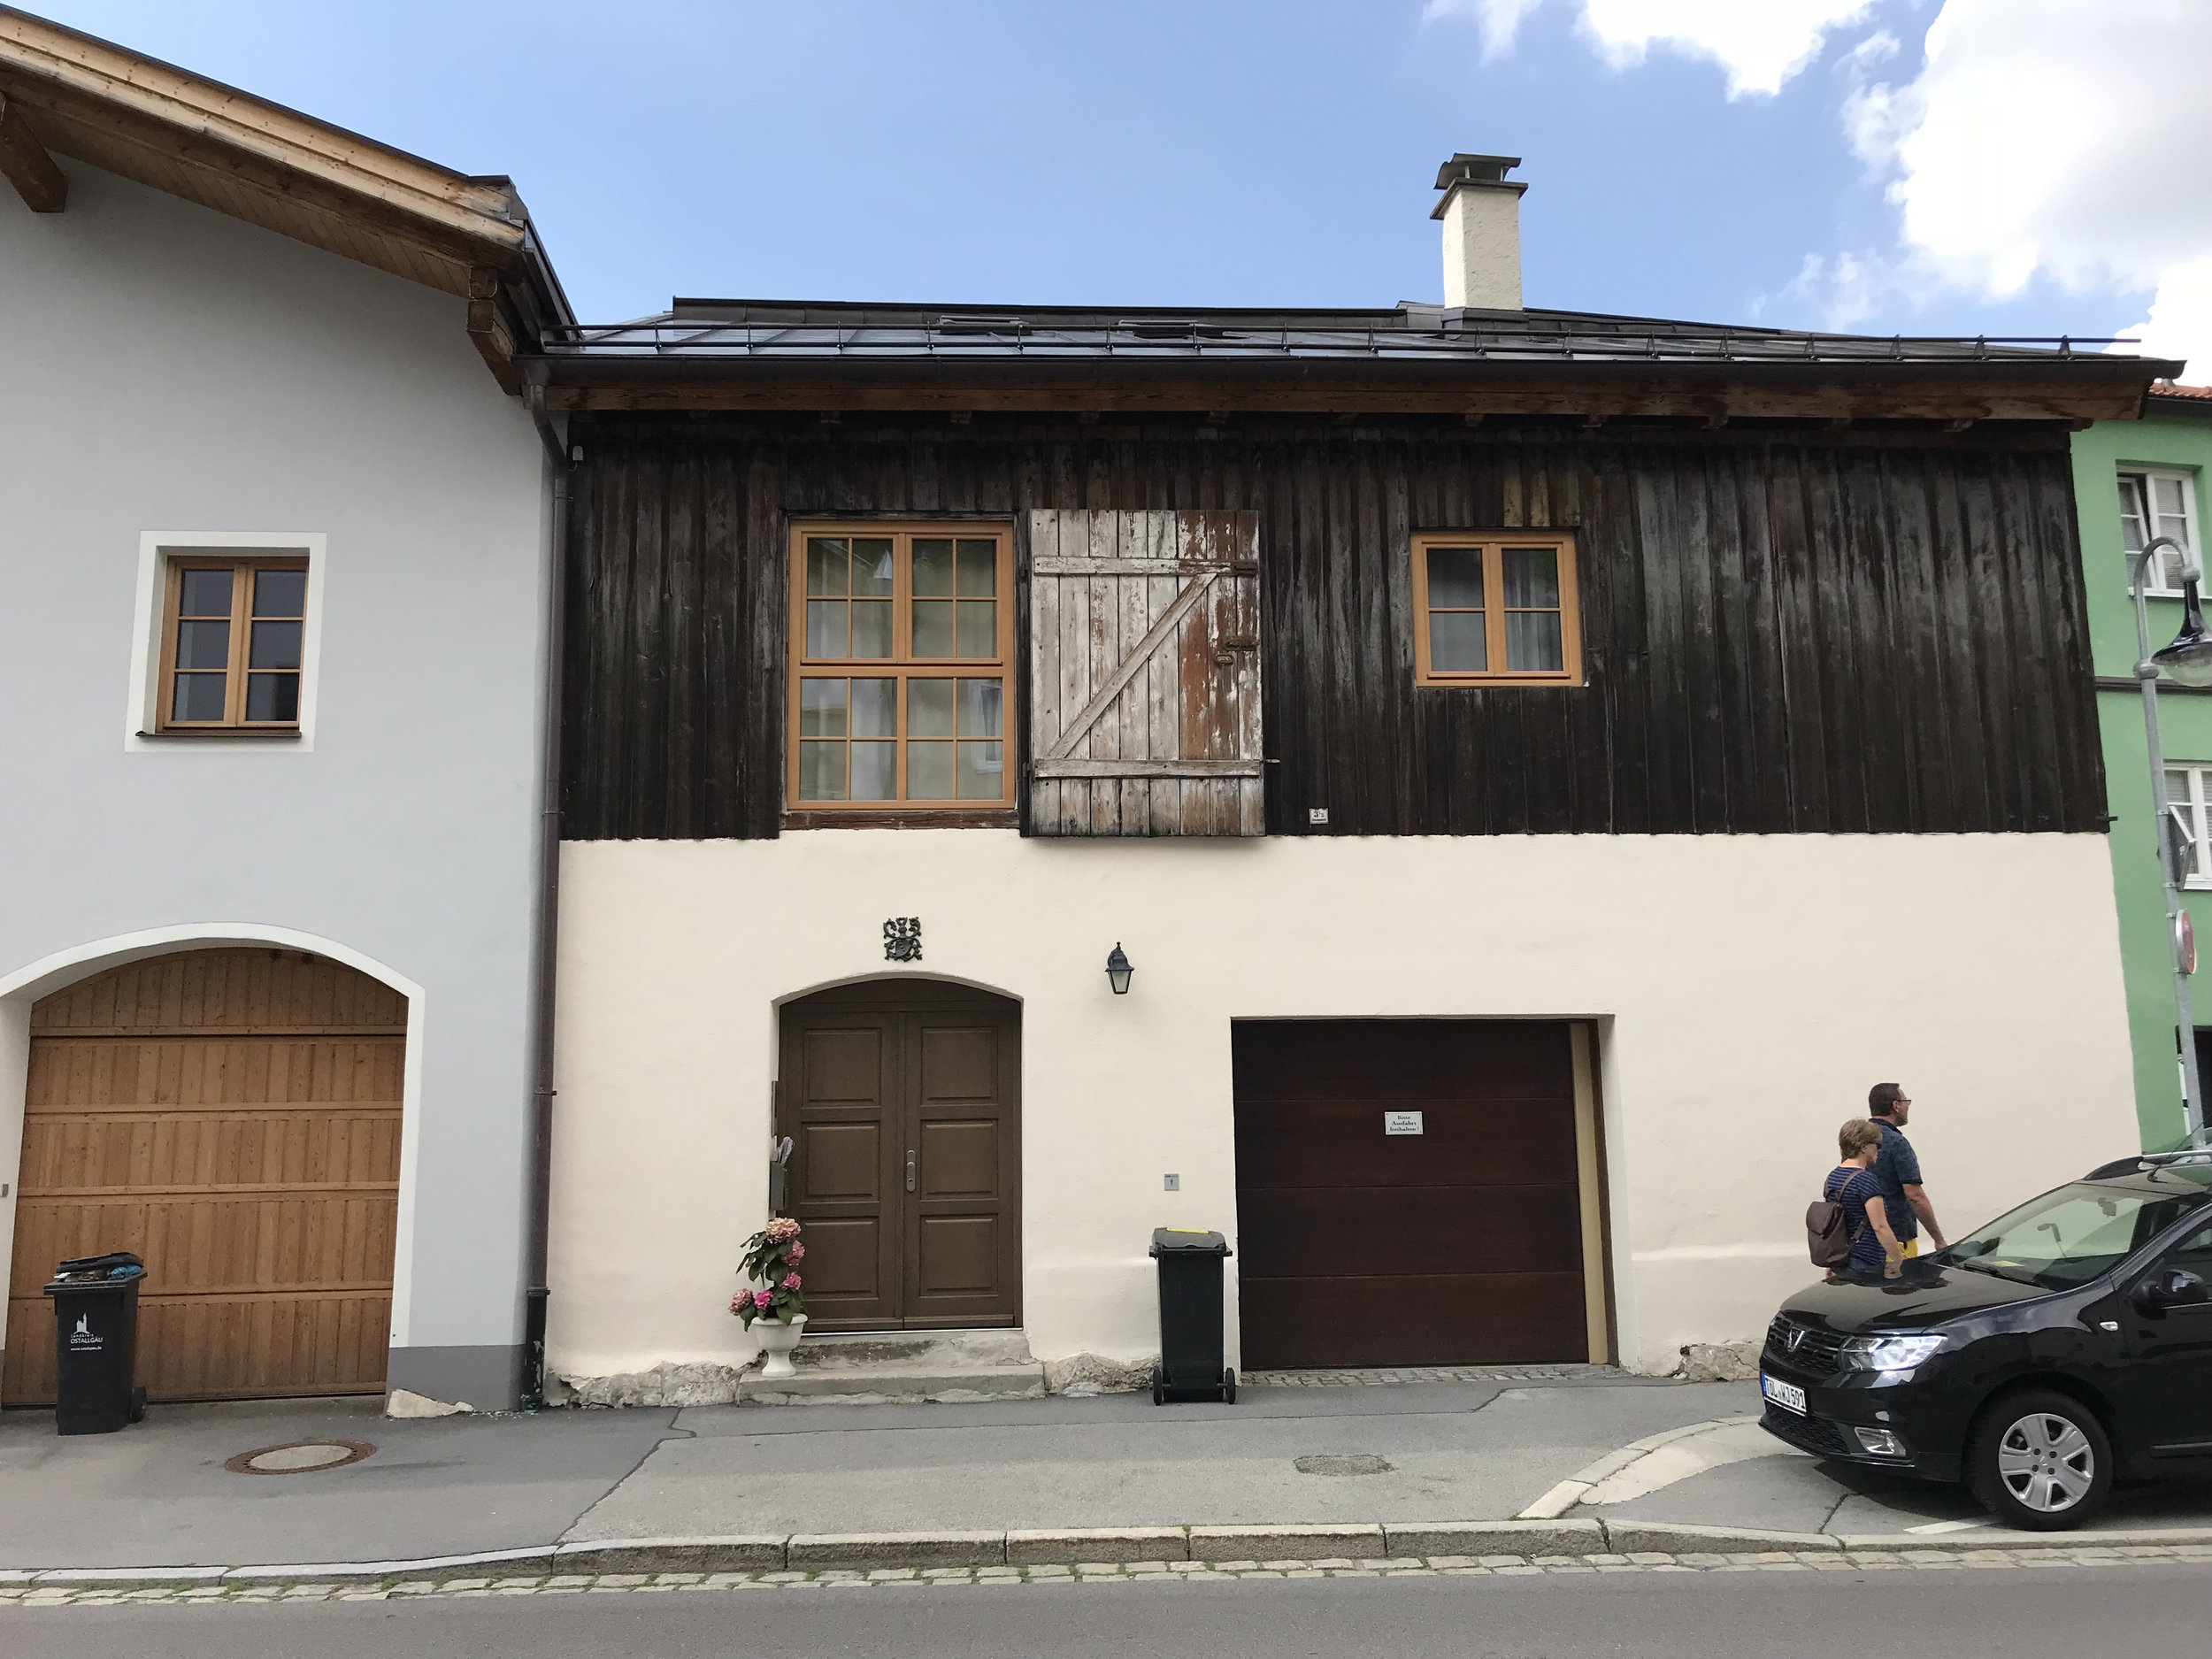 Teri_Day2_Castles_Germany&Austria_spiritedtable_photo03.jpg